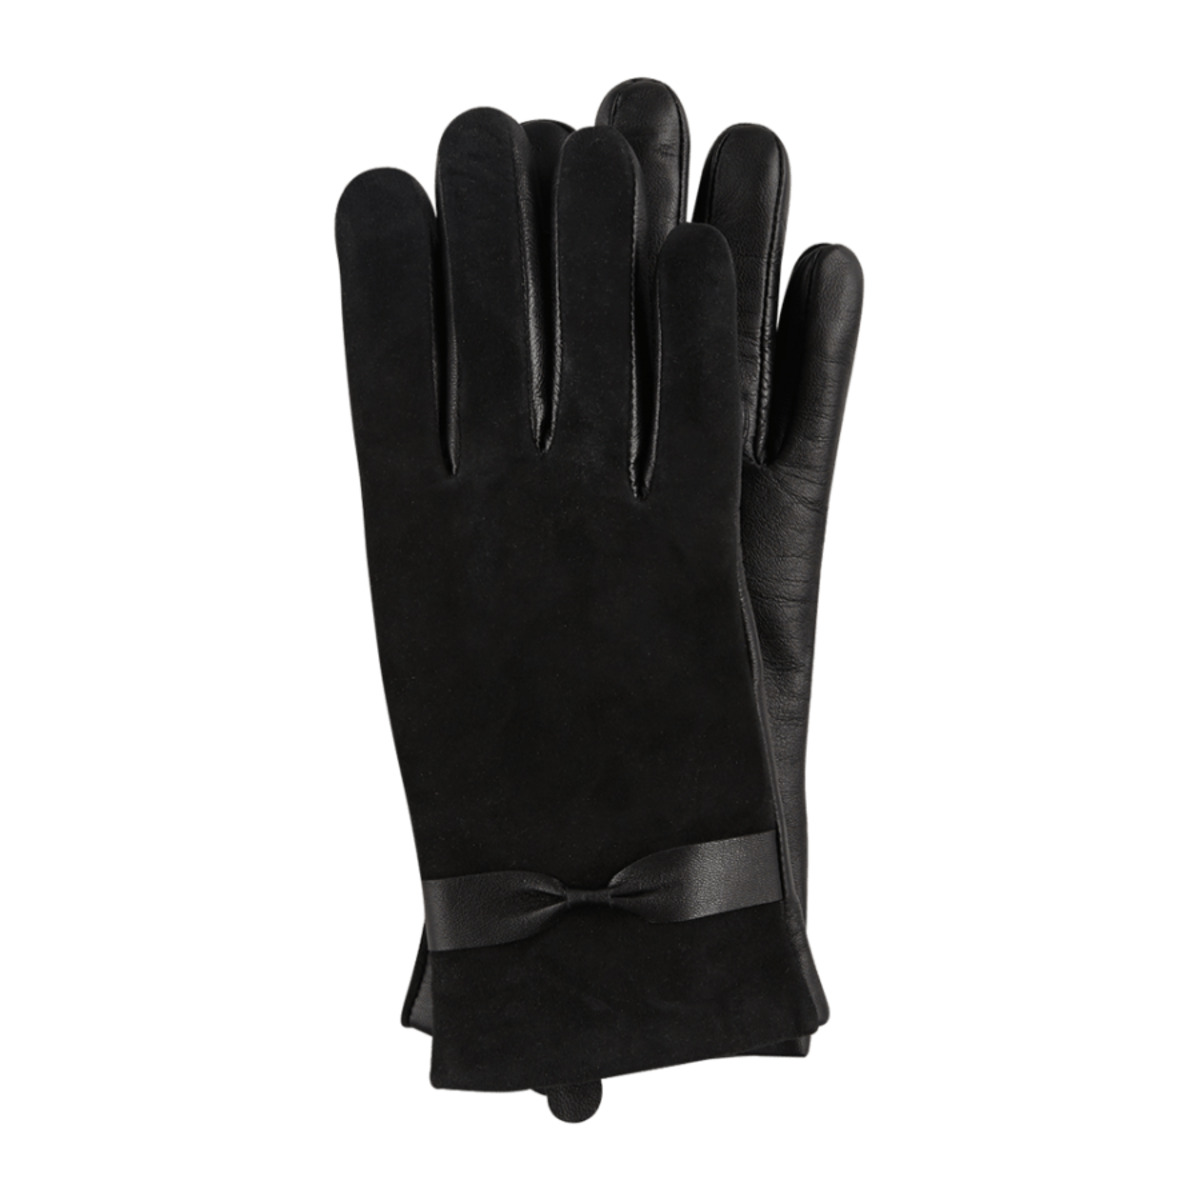 Bild 3 von ROYAL LIFE     Leder-Handschuhe